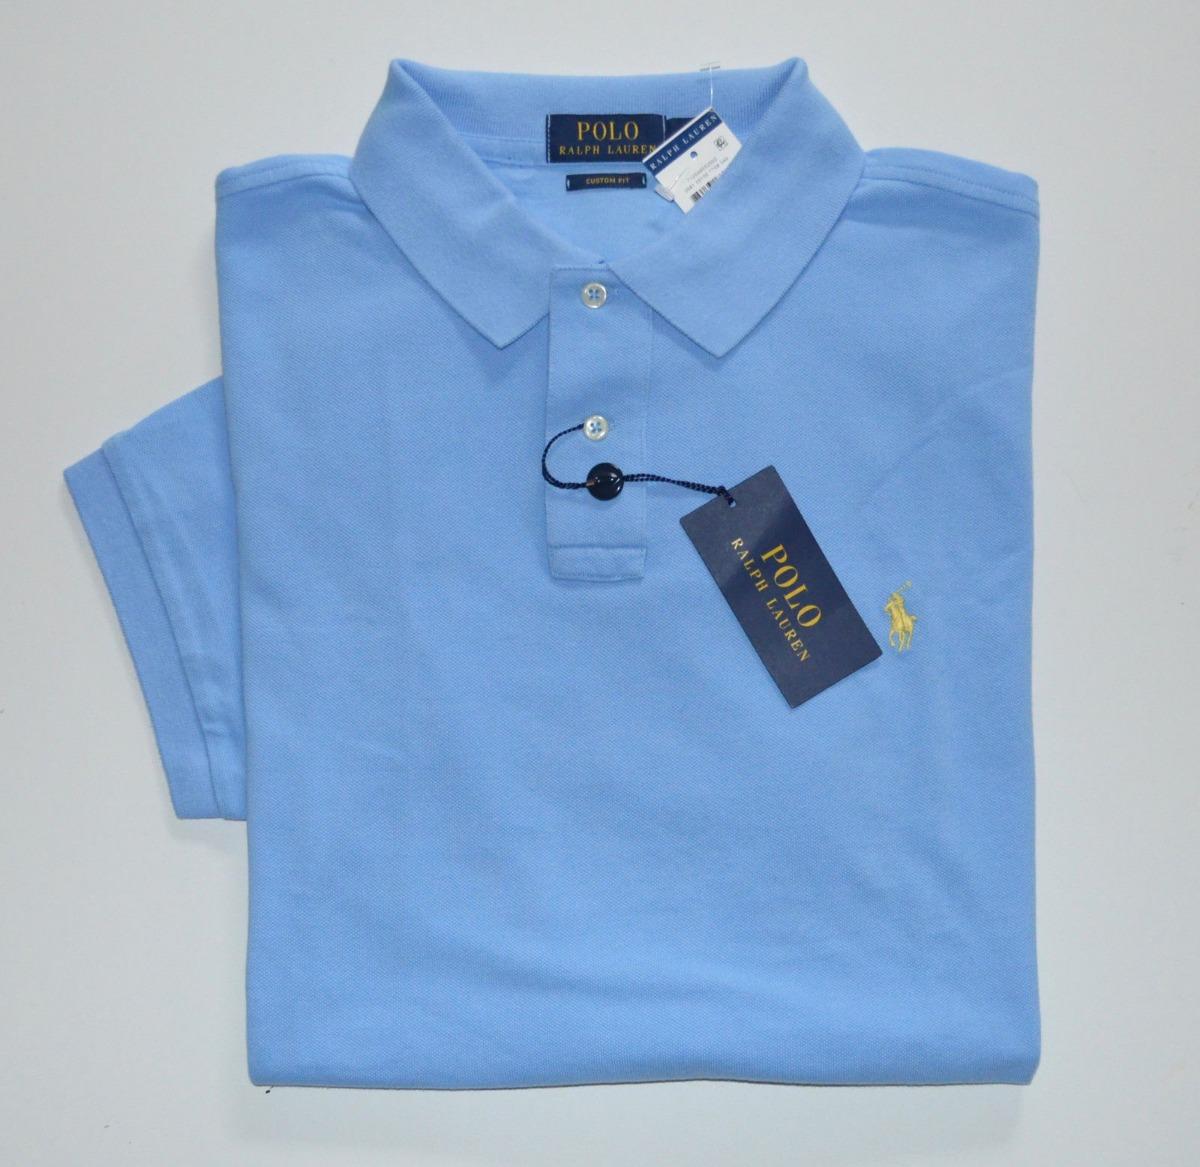 camisa polo ralph lauren tamanho xxl ggg slim fit + justa. Carregando zoom. a0e0aa0e92bf9